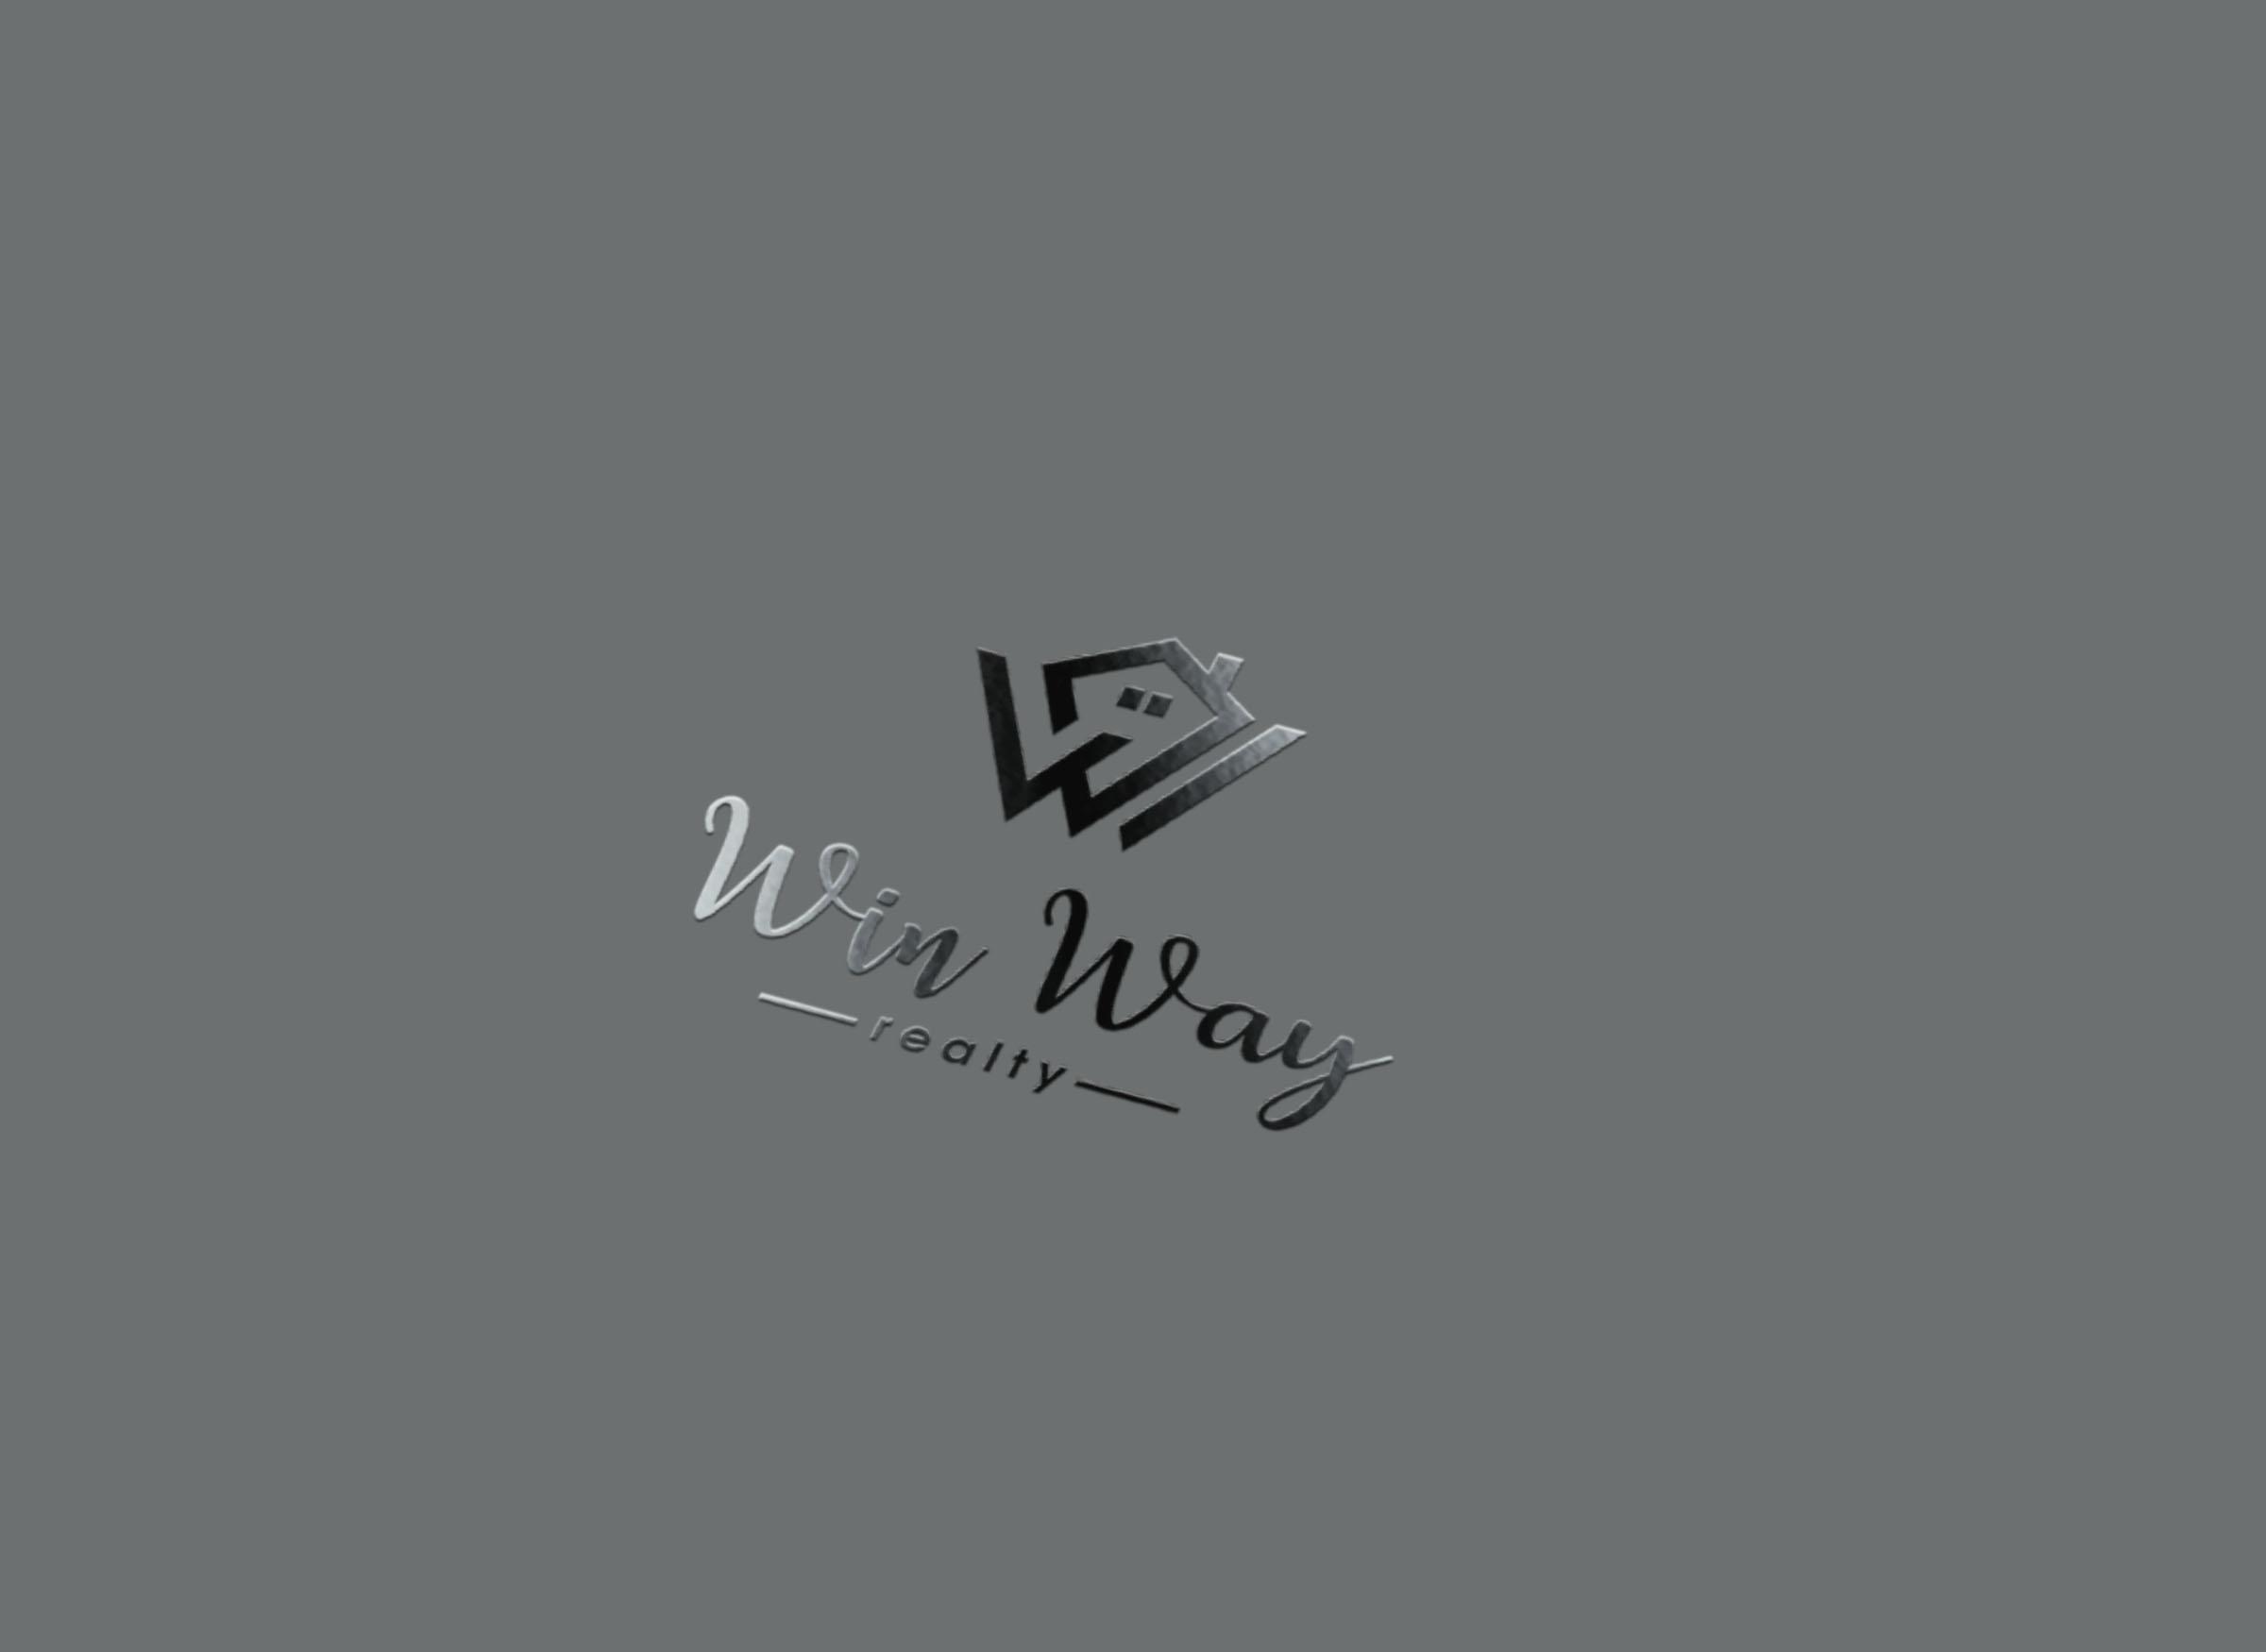 Логотип для агентства недвижимости фото f_5205aace2dcdc850.jpg